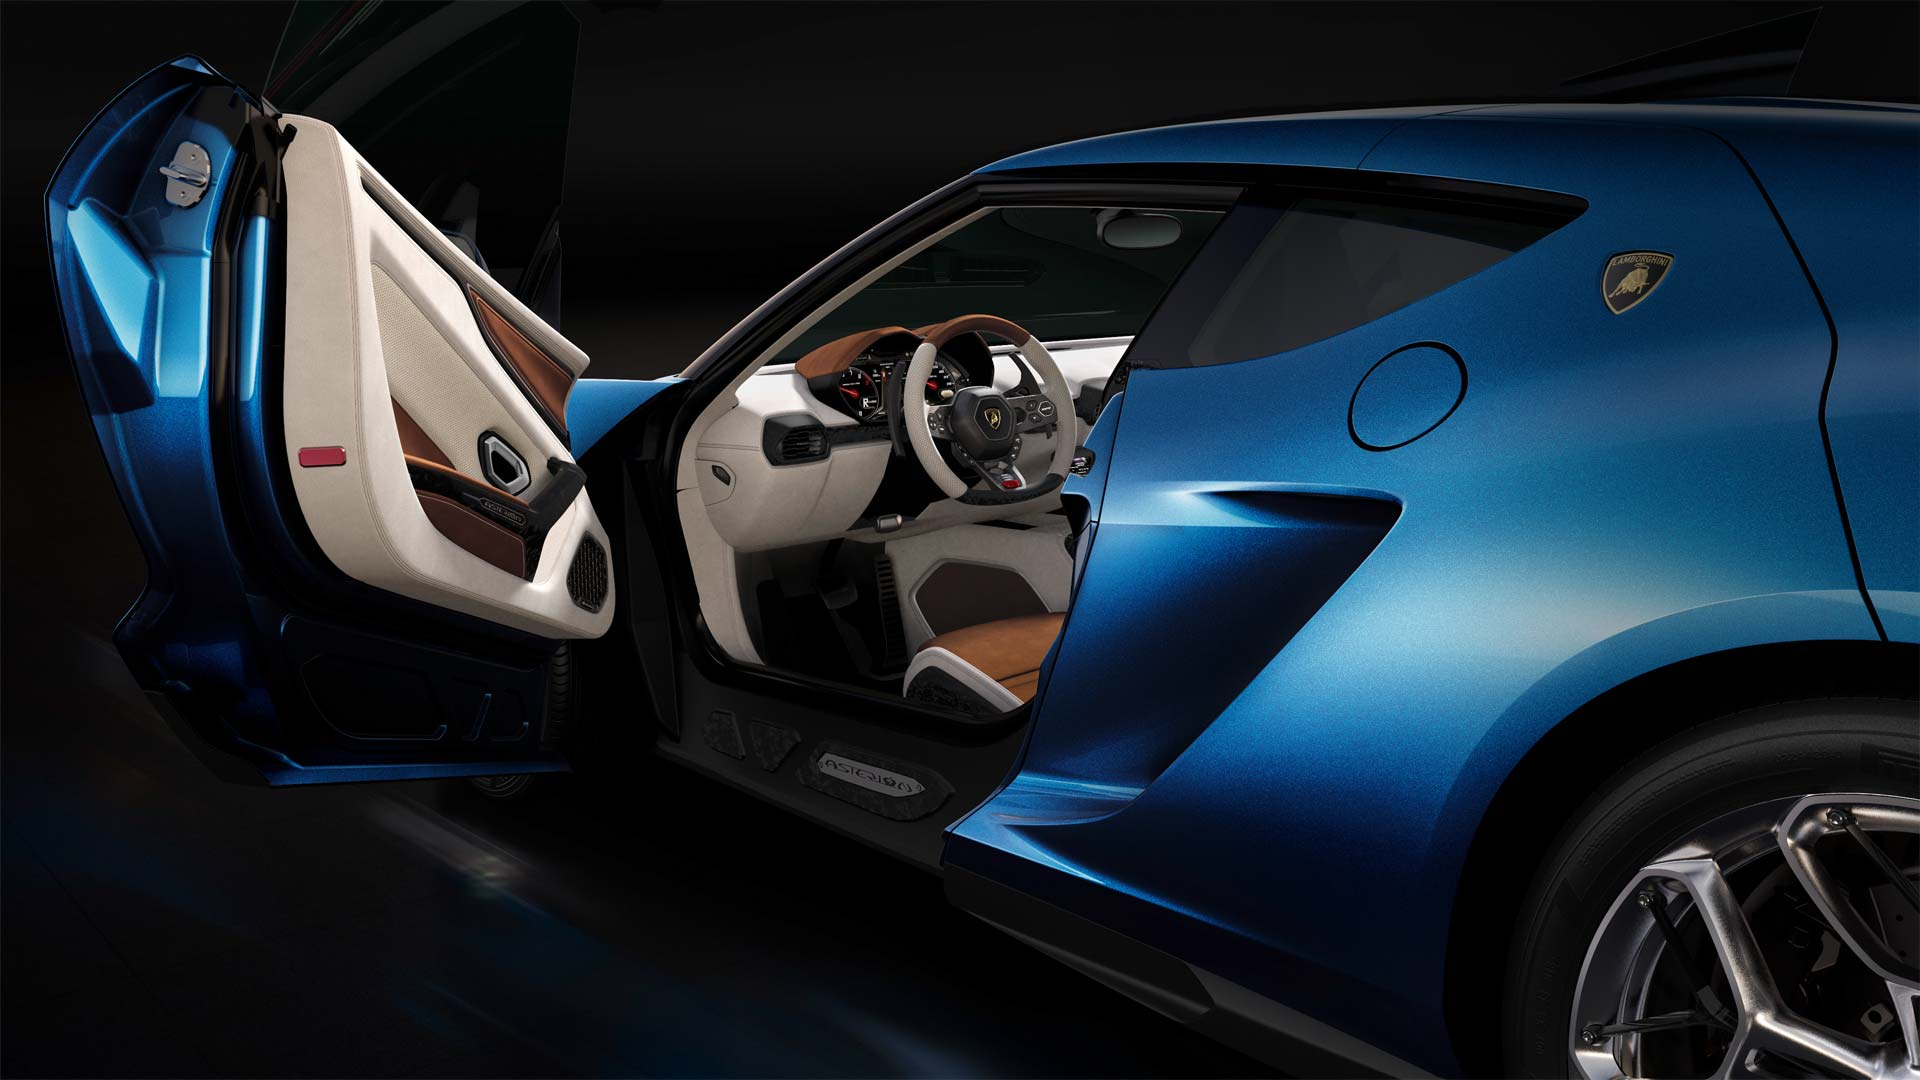 Lamborghini Asterion LPI 910-4 - benvenuto